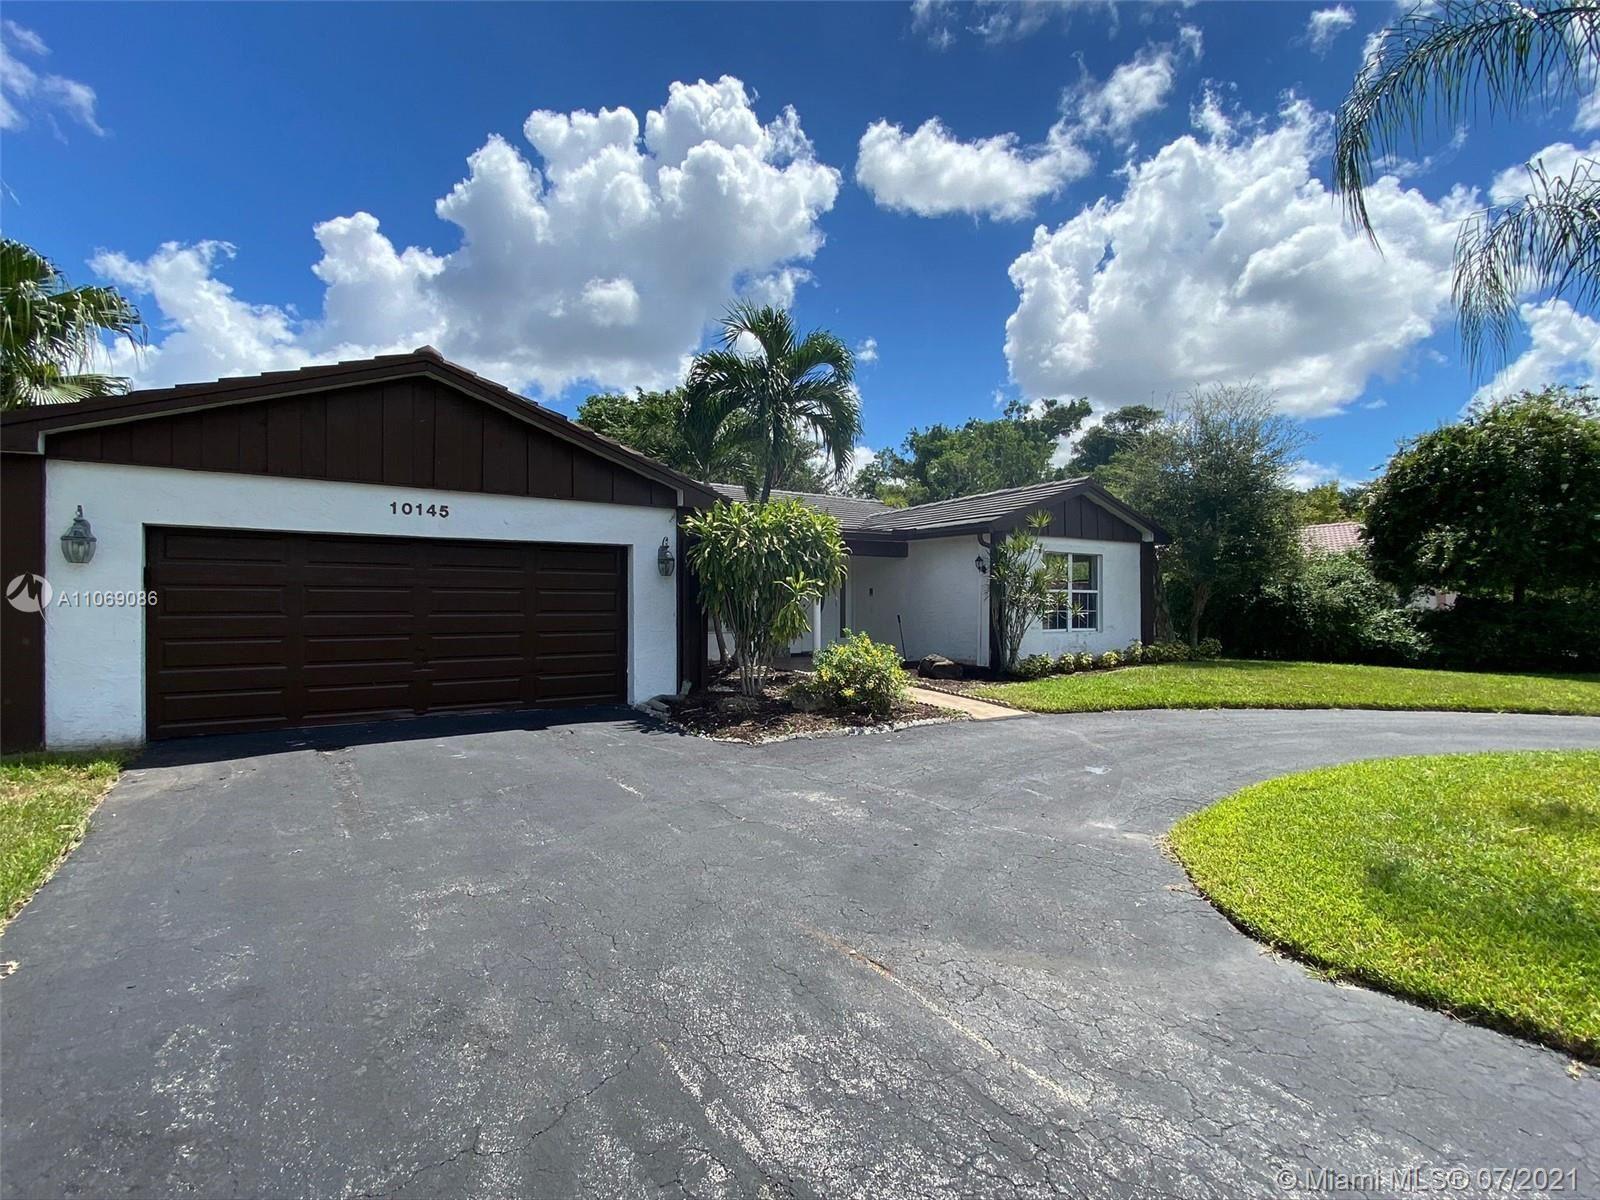 10145 Ramblewood Dr, Coral Springs, FL 33071 - #: A11069086